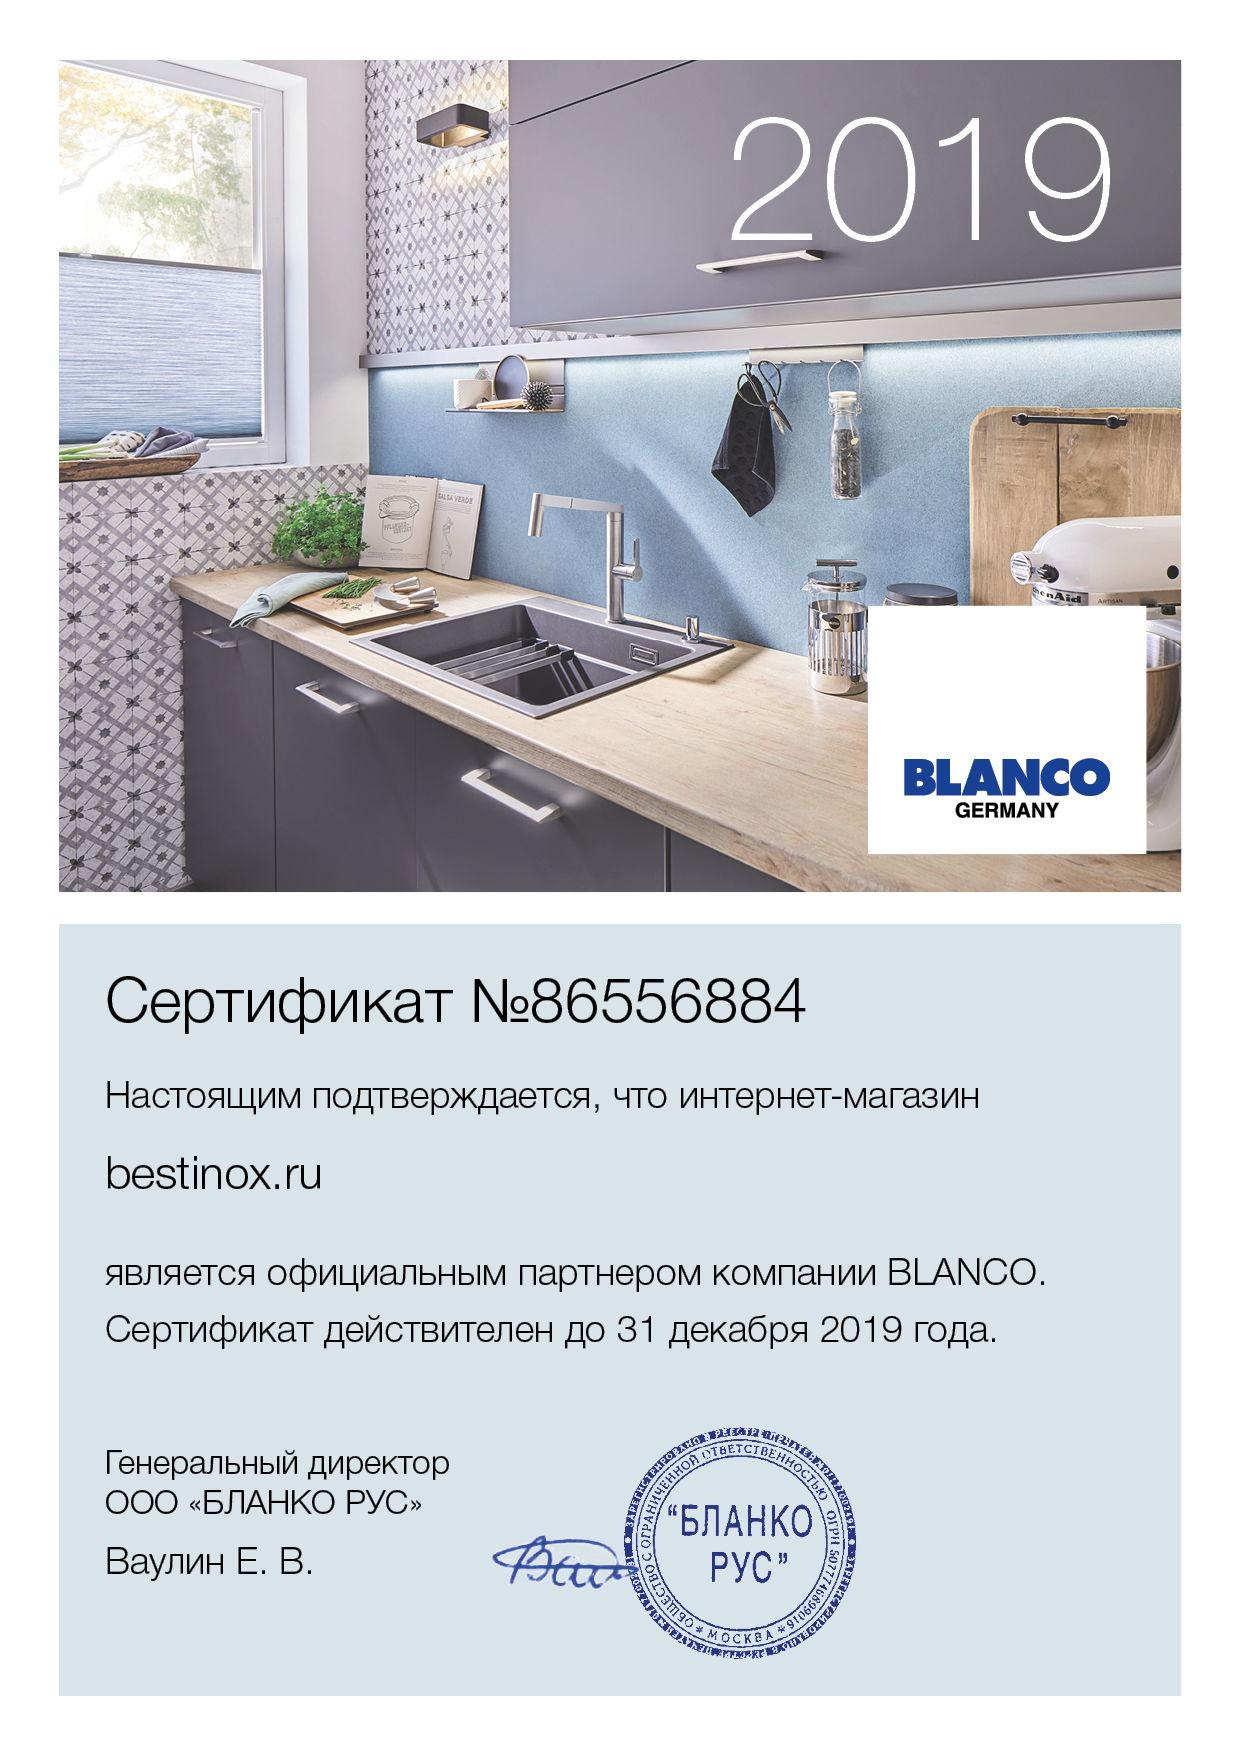 certificate_BLANCO